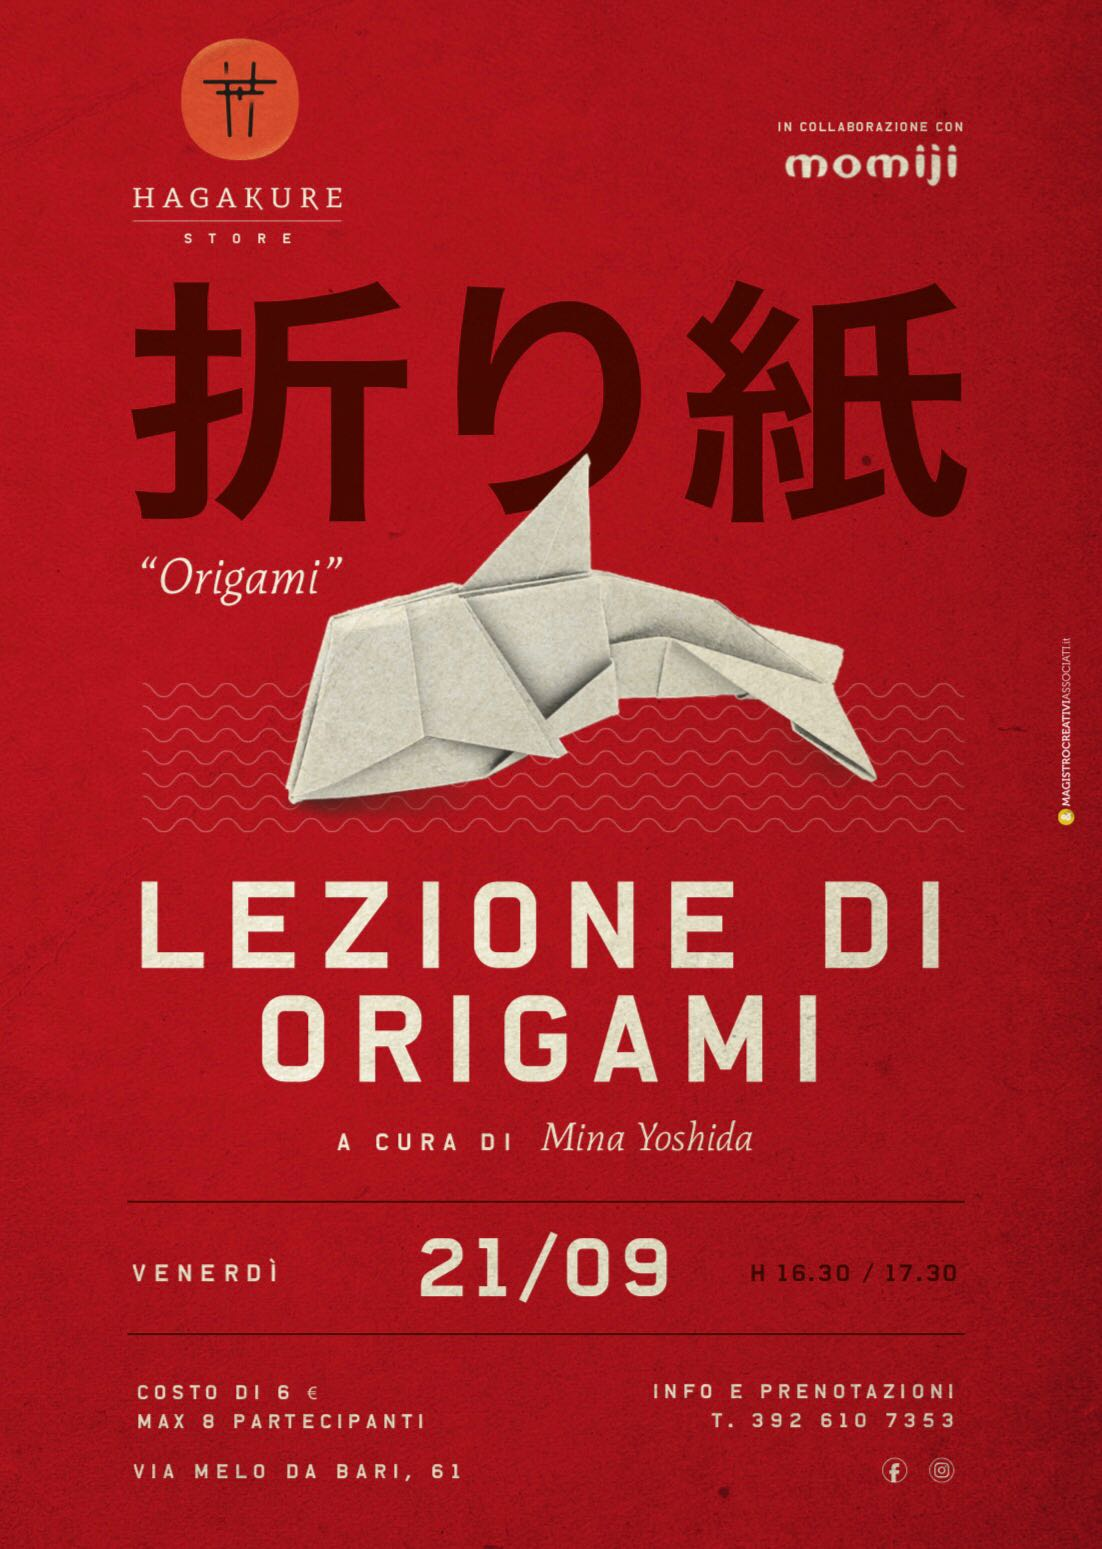 SAVE THE DATE - LEZIONE DI ORIGAMI